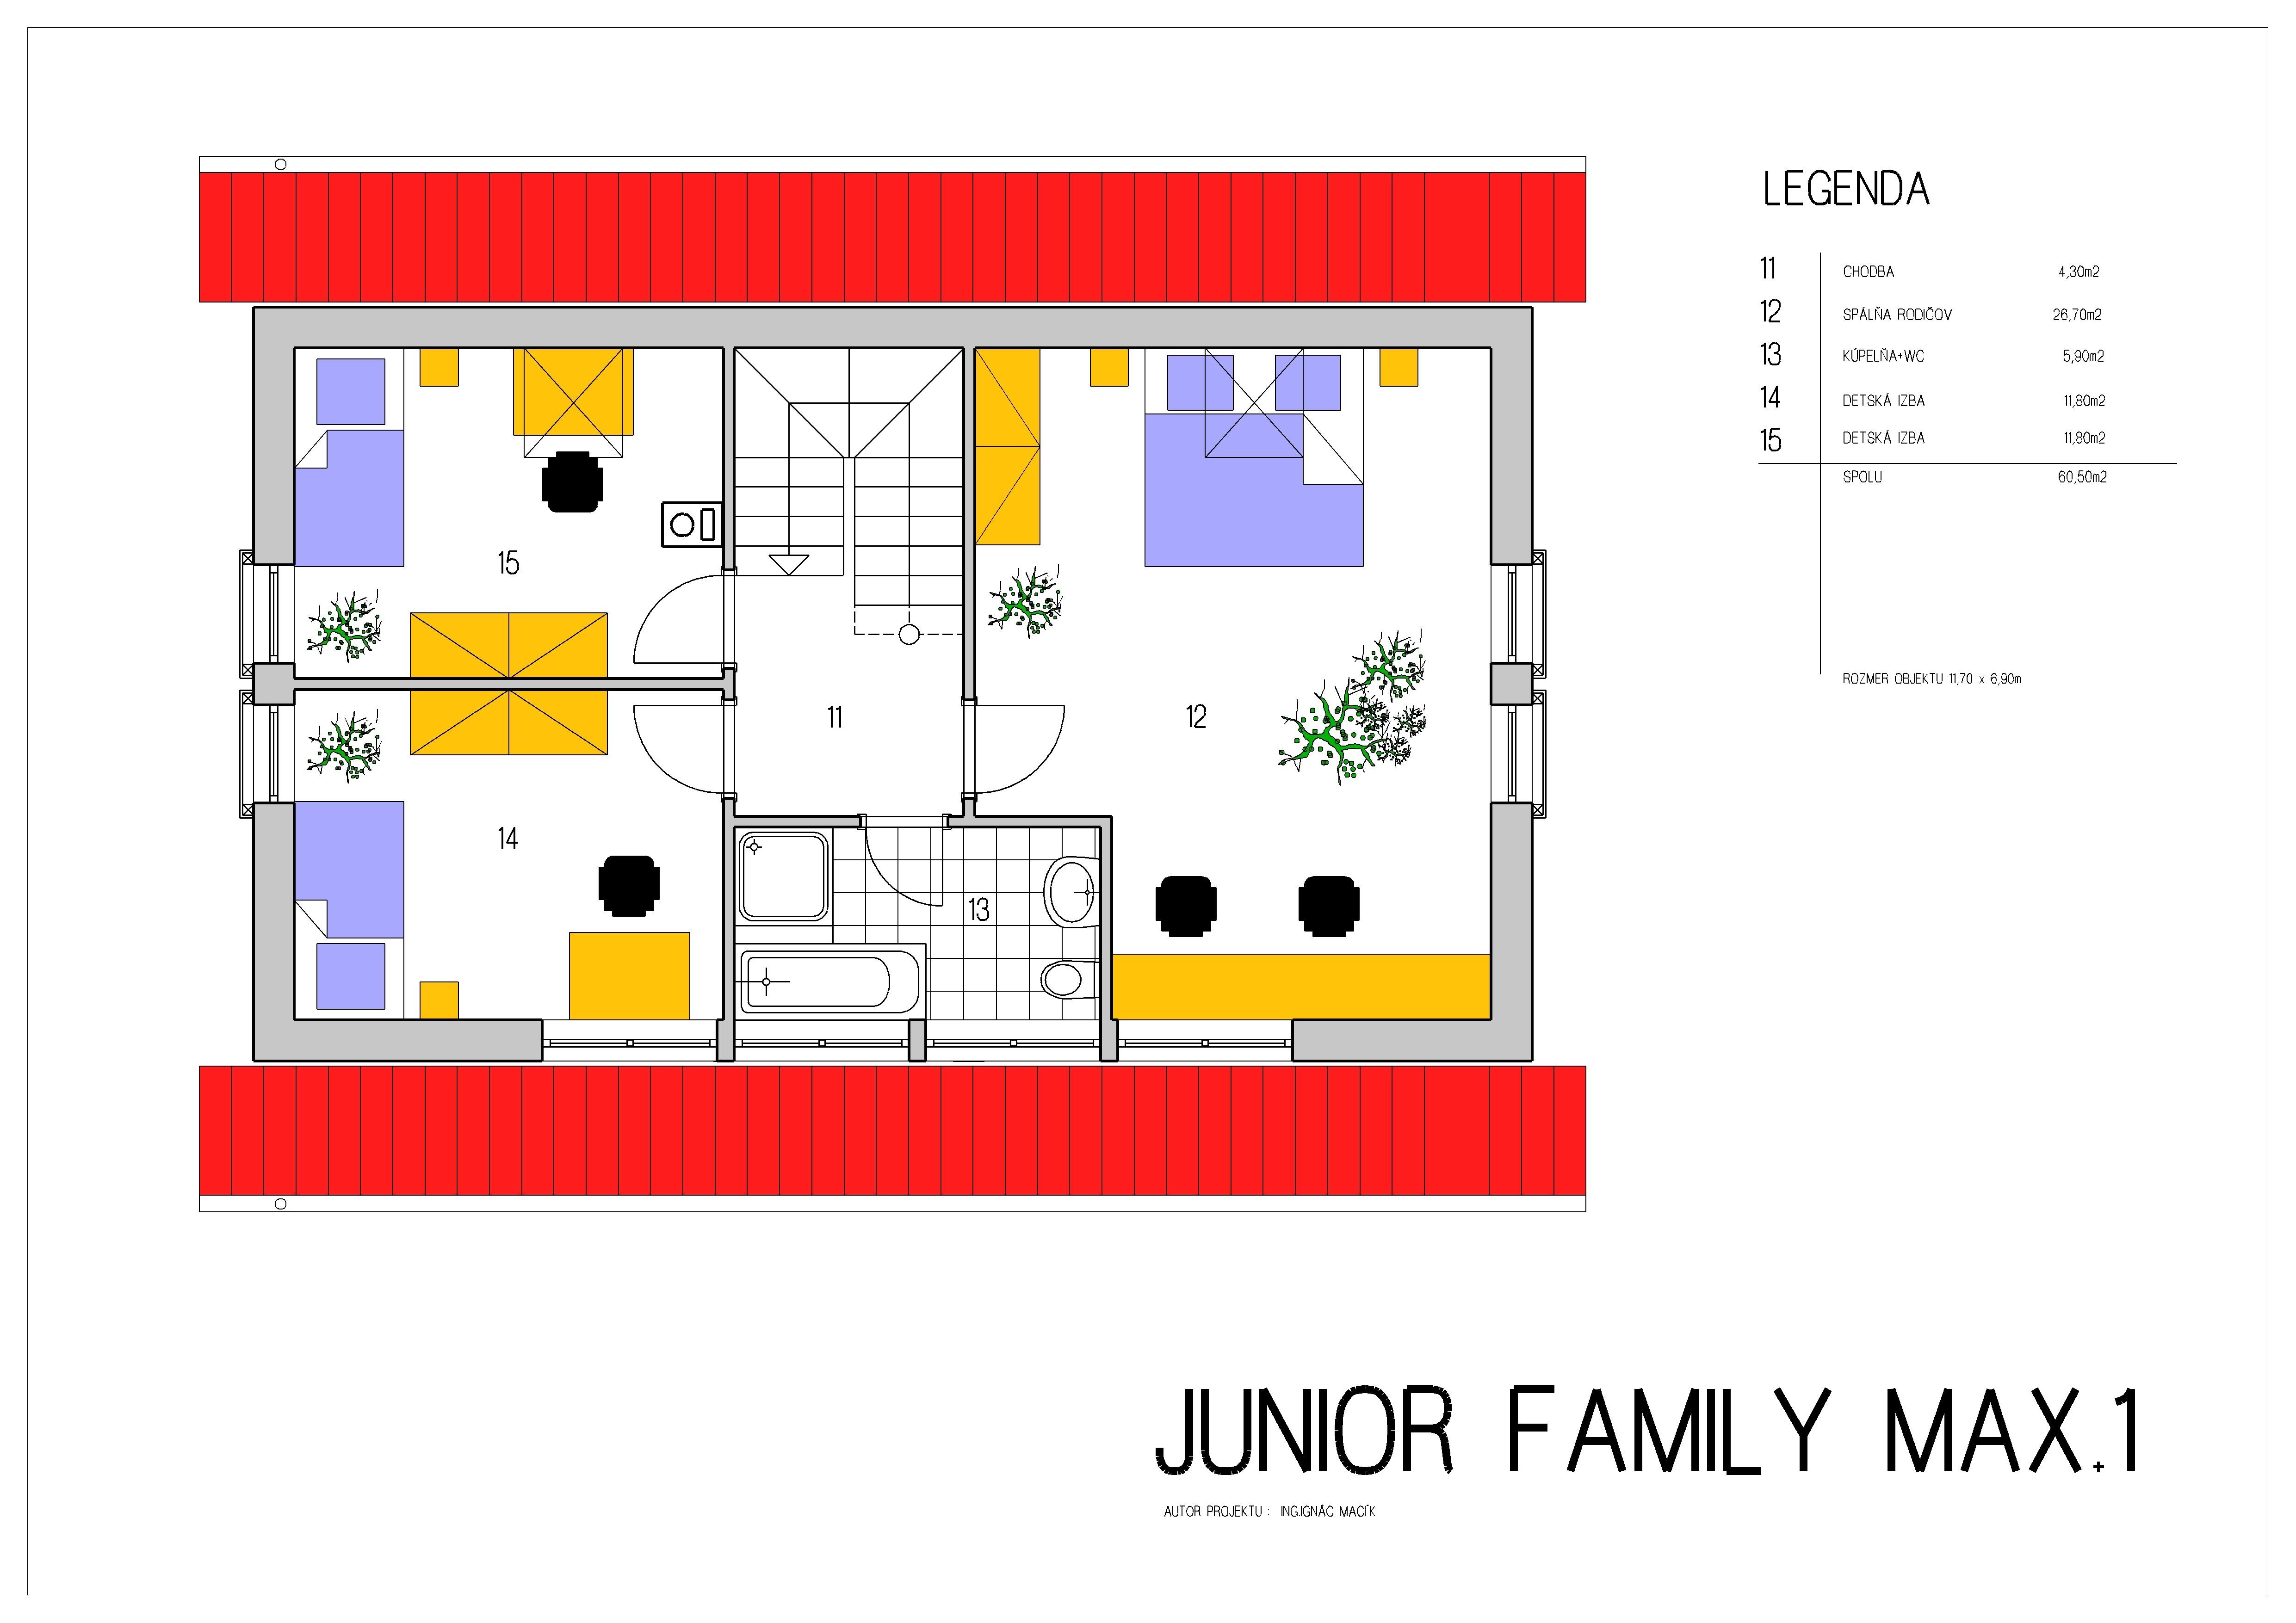 junior-family-max-podorys-podkrovie_2-001_0